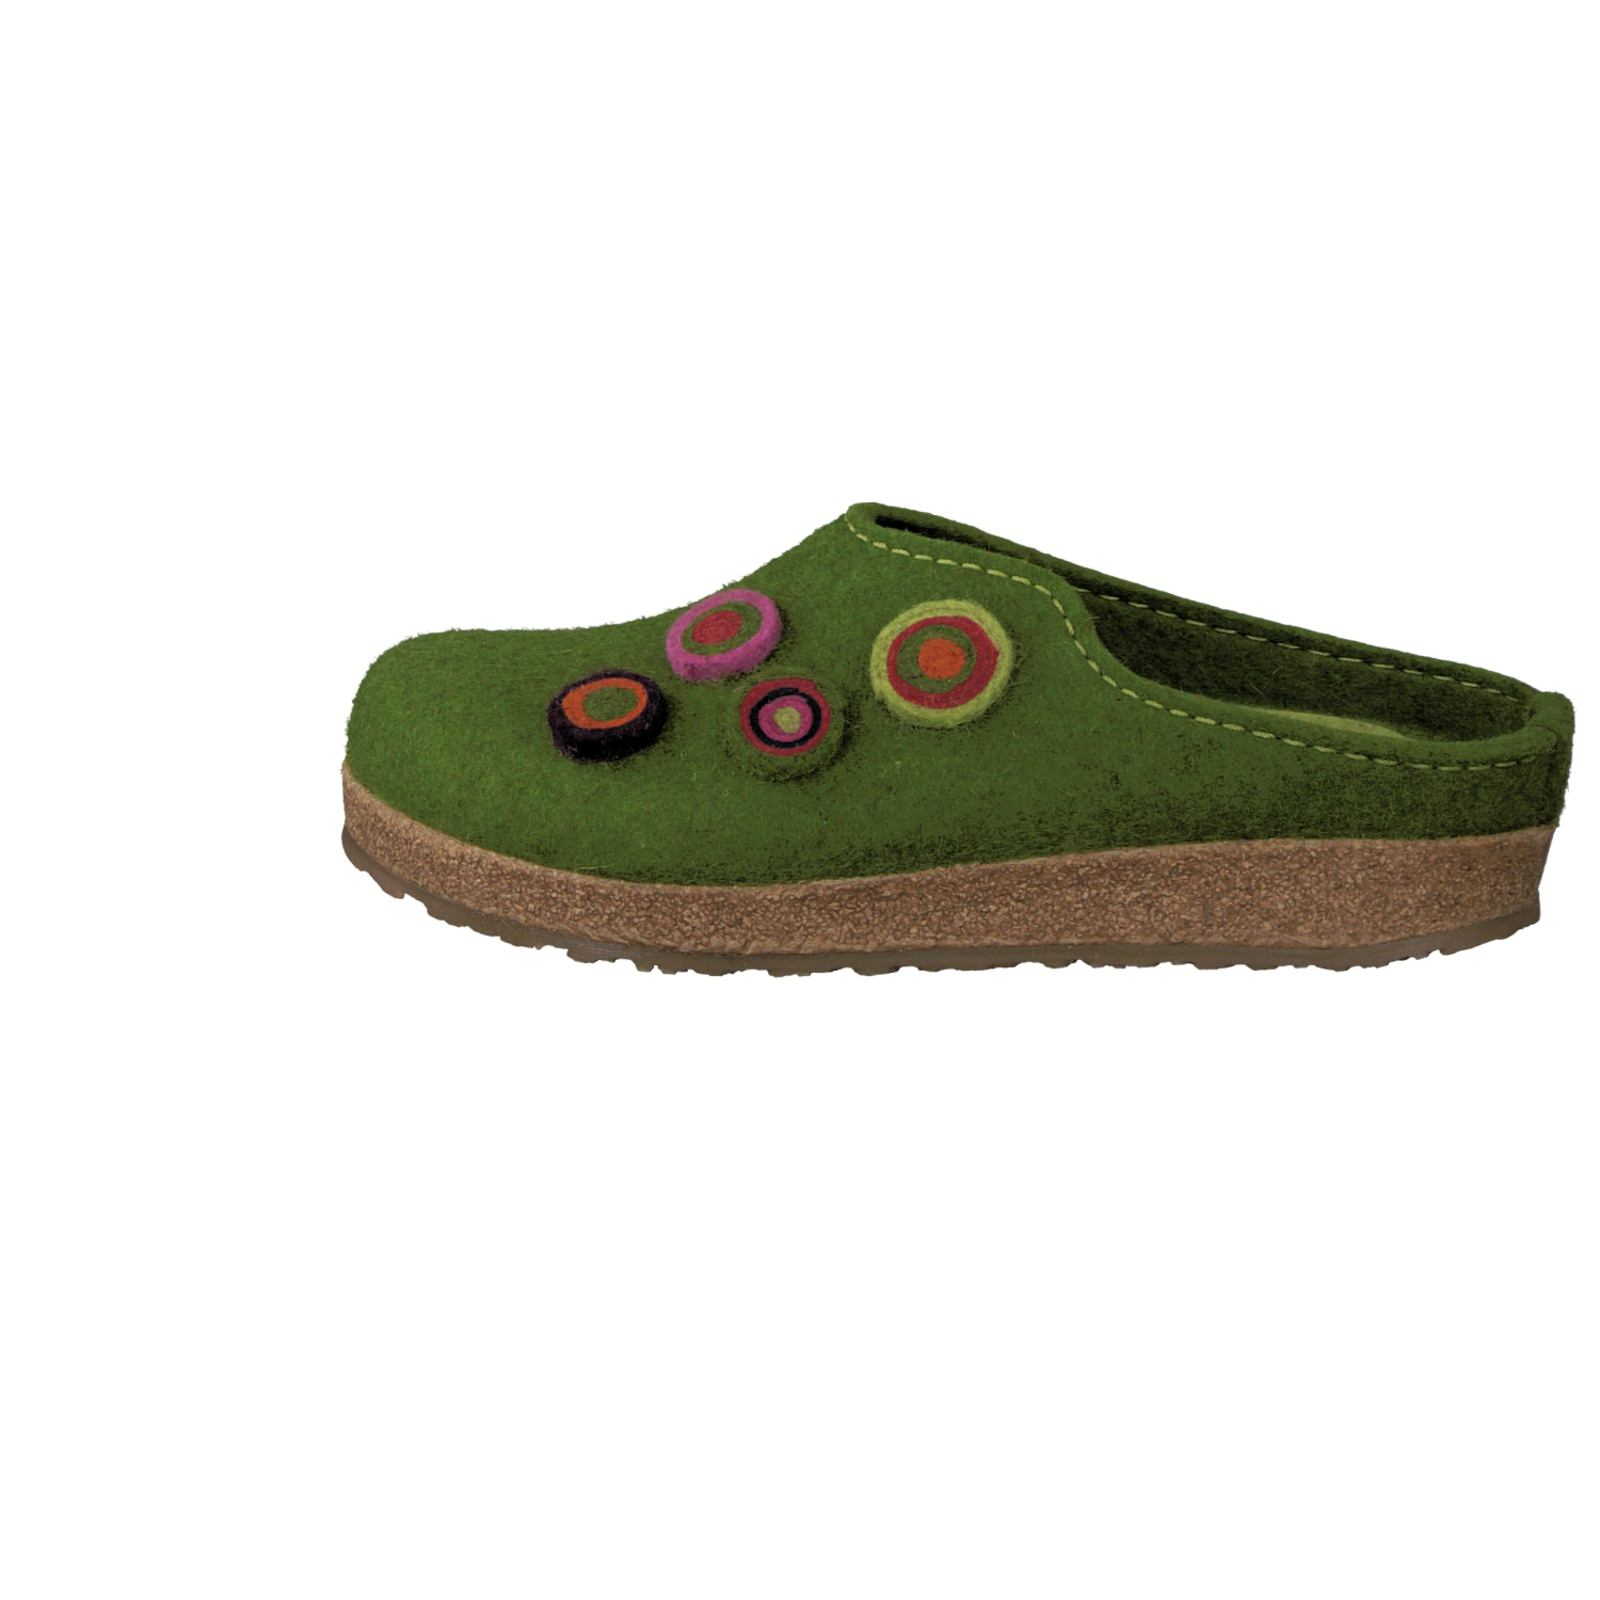 Haflinger Damen Hausschuh in grün kaufen   Zumnorde Online-Shop 51cf9b7d95